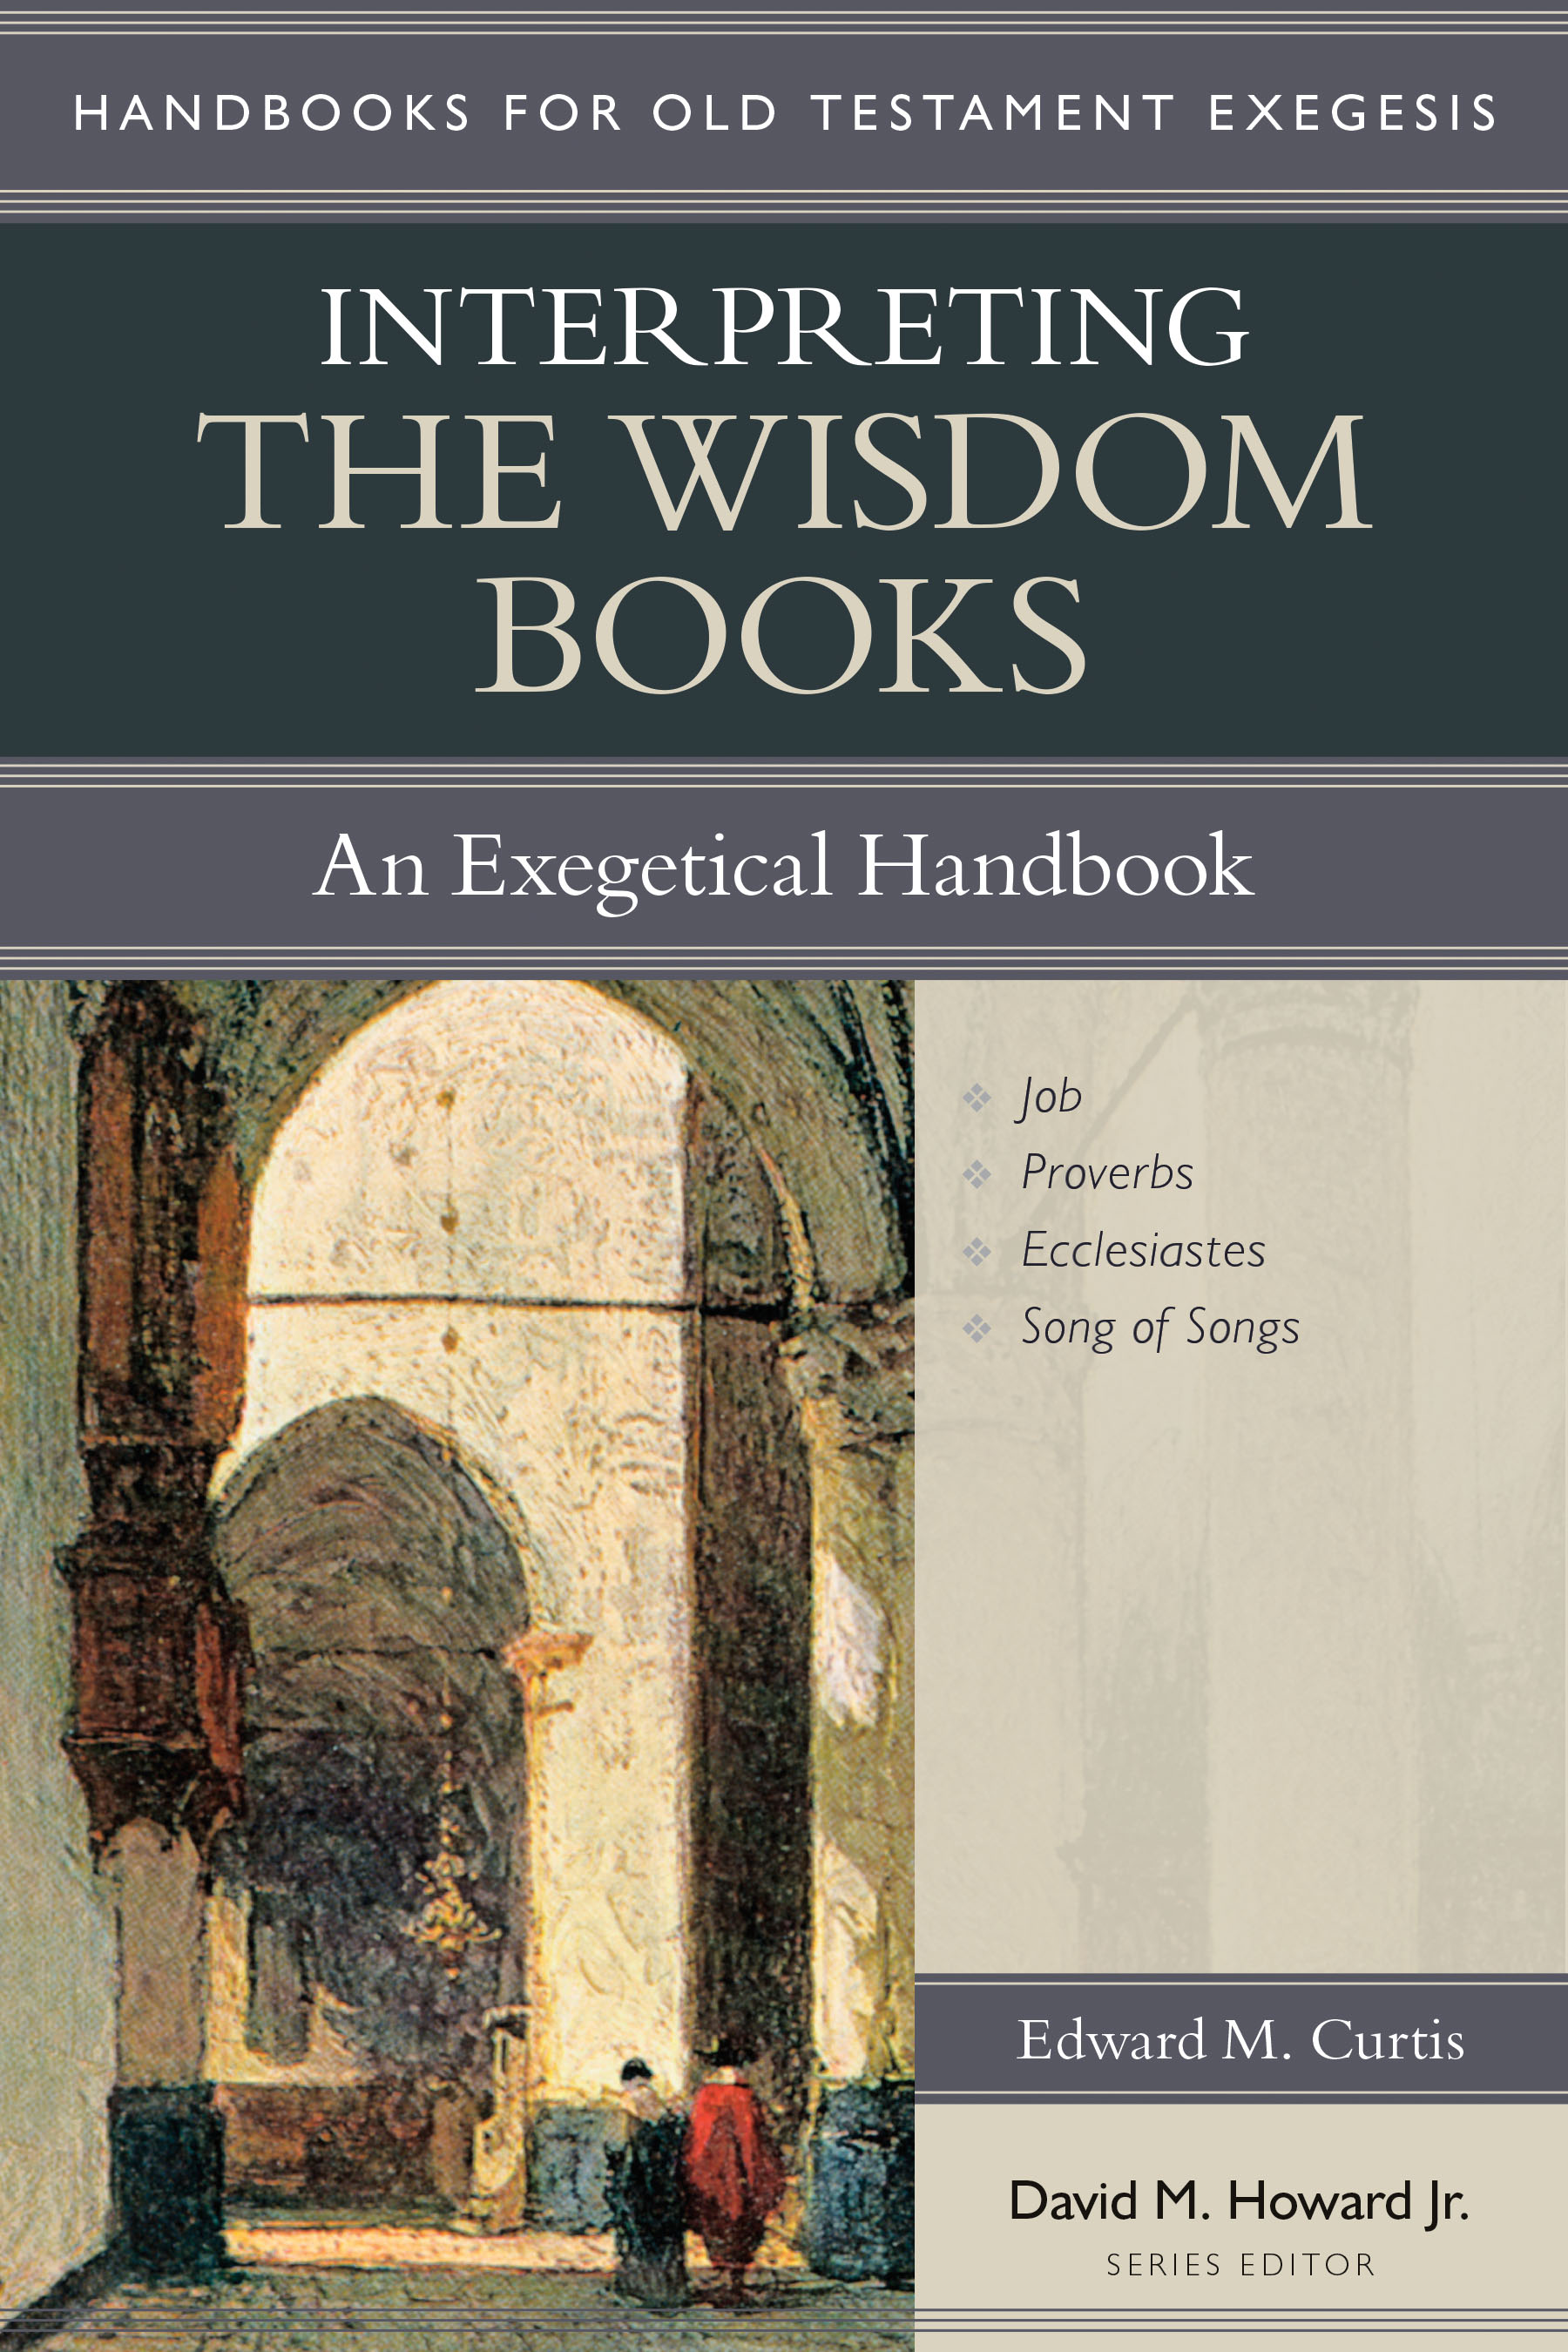 Interpreting the Wisdom Books: An Exegetical Handbook